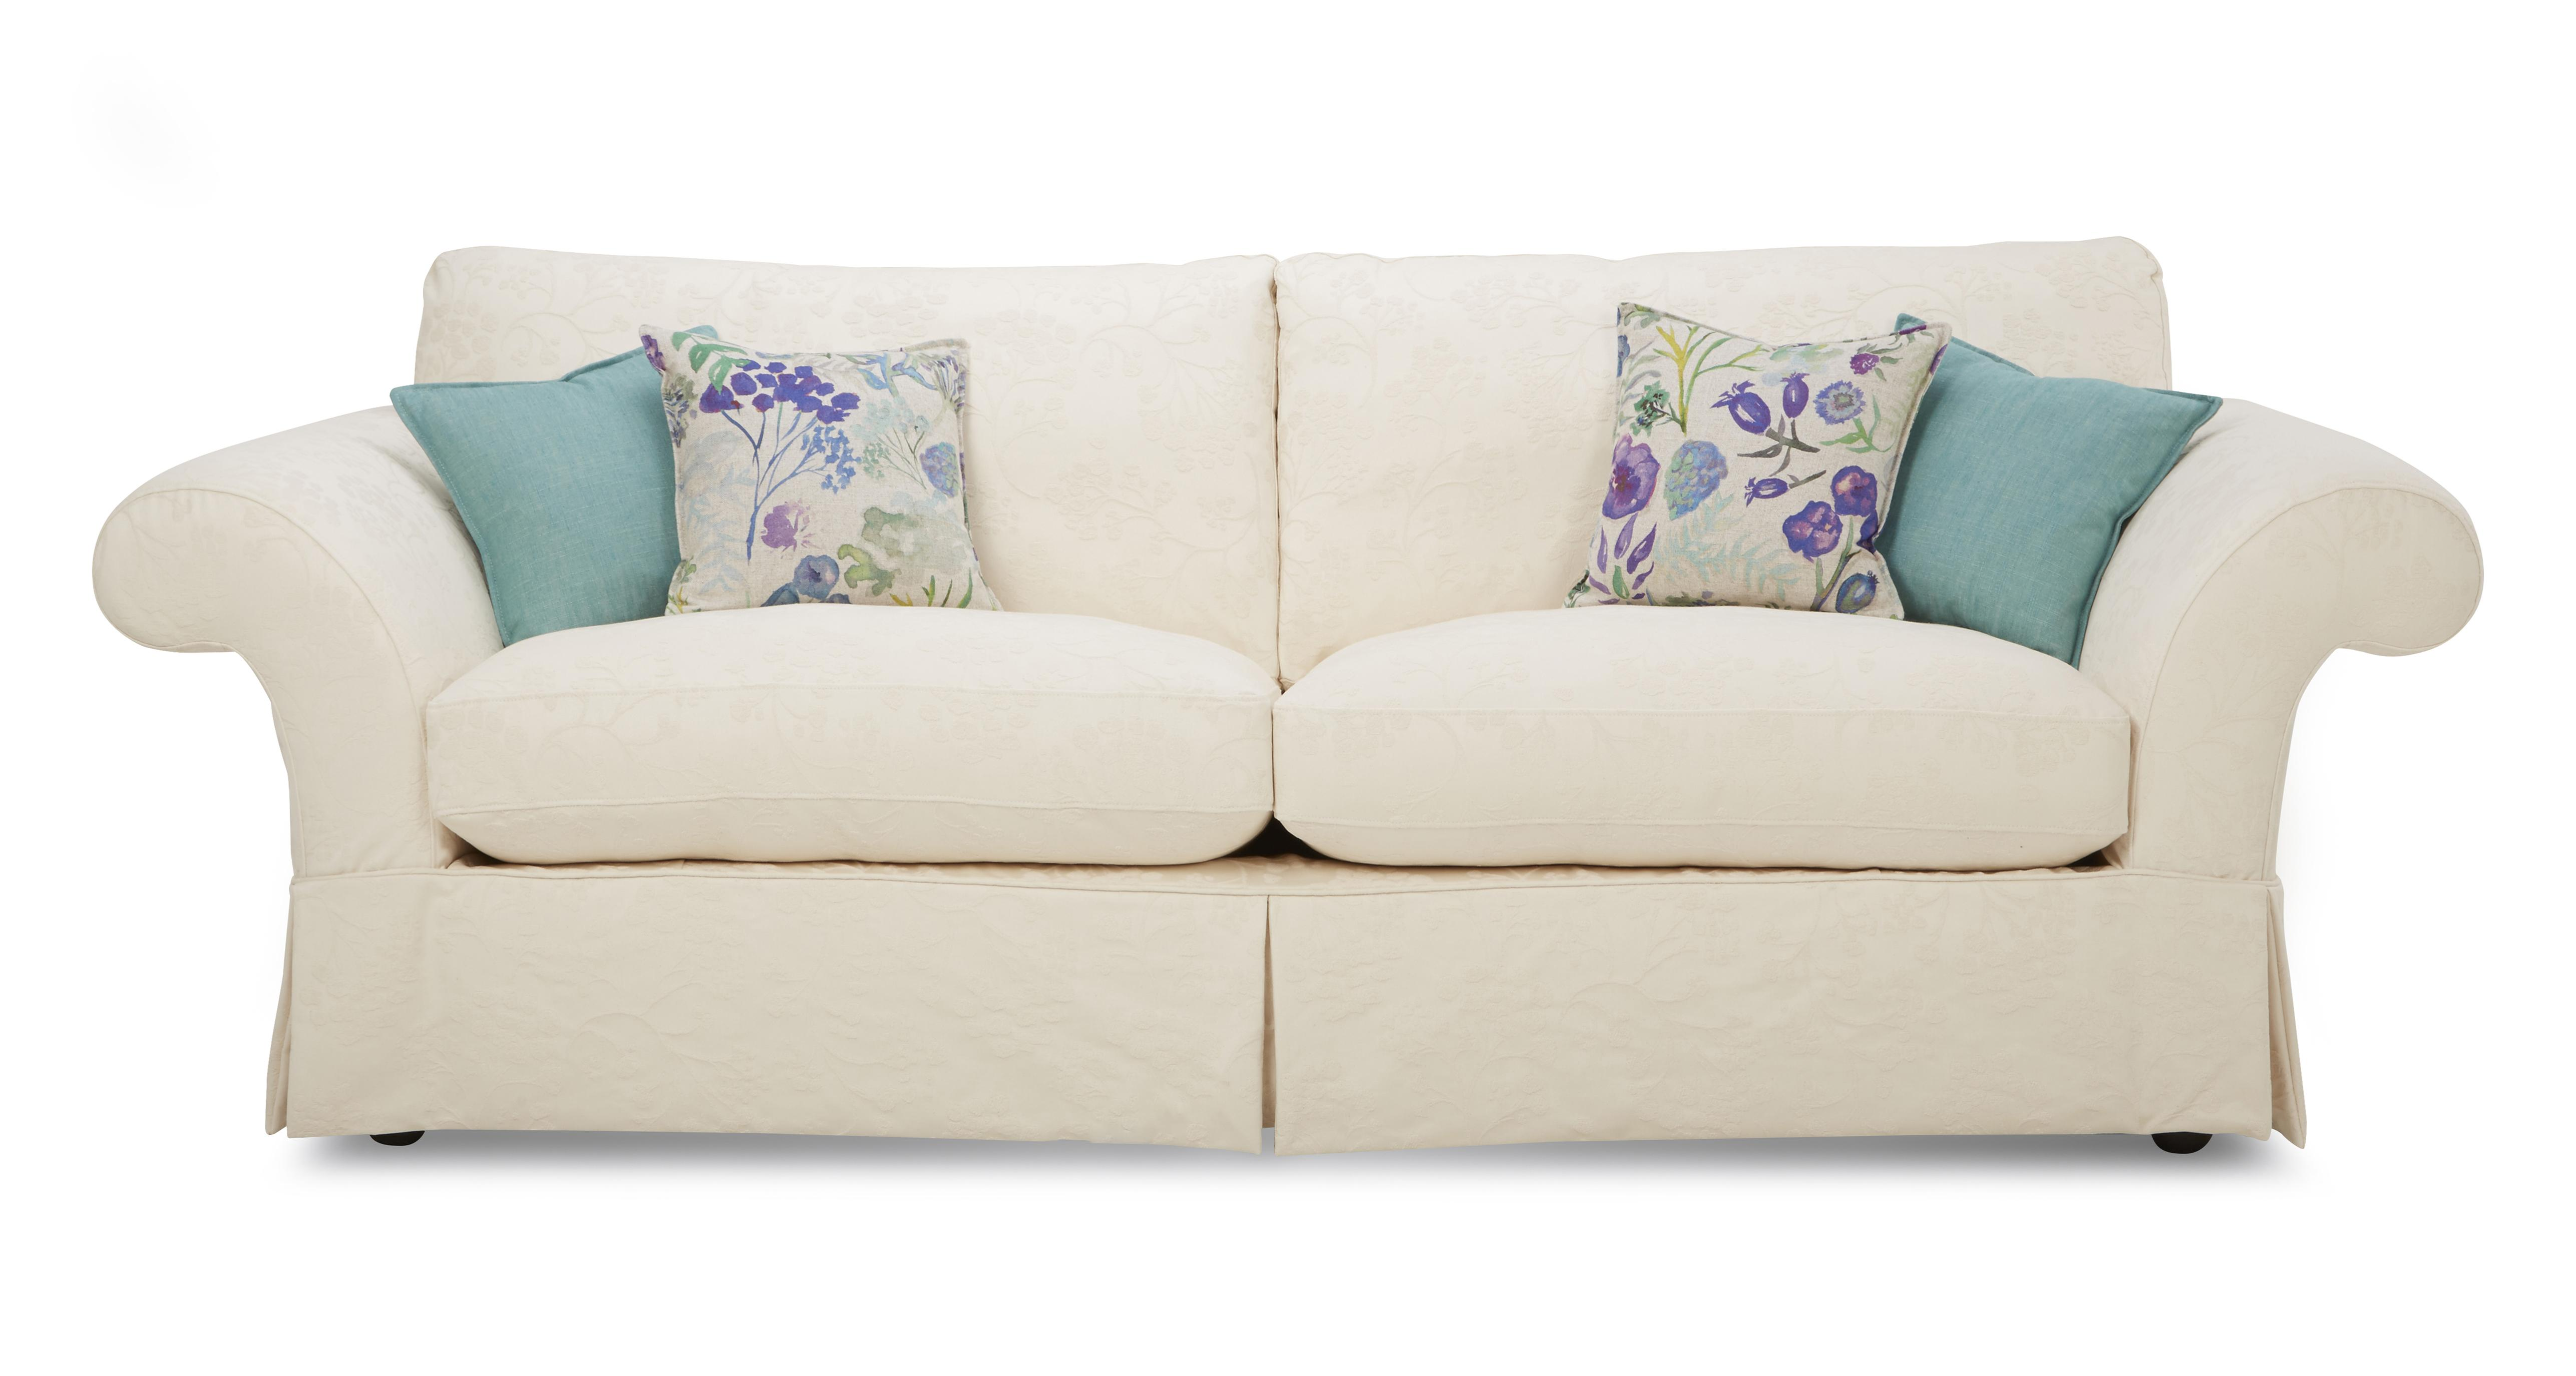 sofa slipcover patterns free mid century leather sofas malvern pattern grand dfs